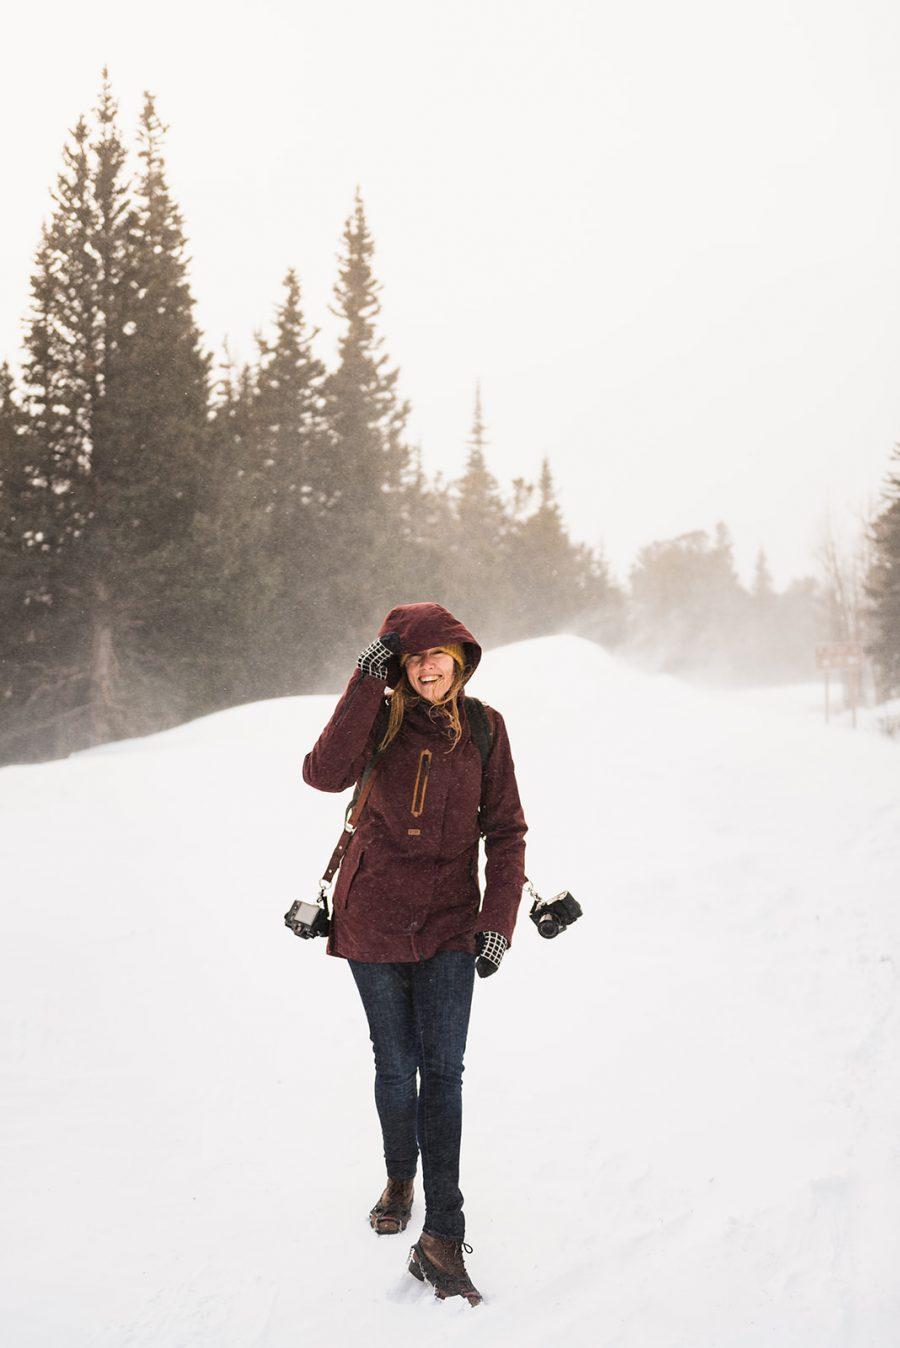 Fuji photographer in blizzard